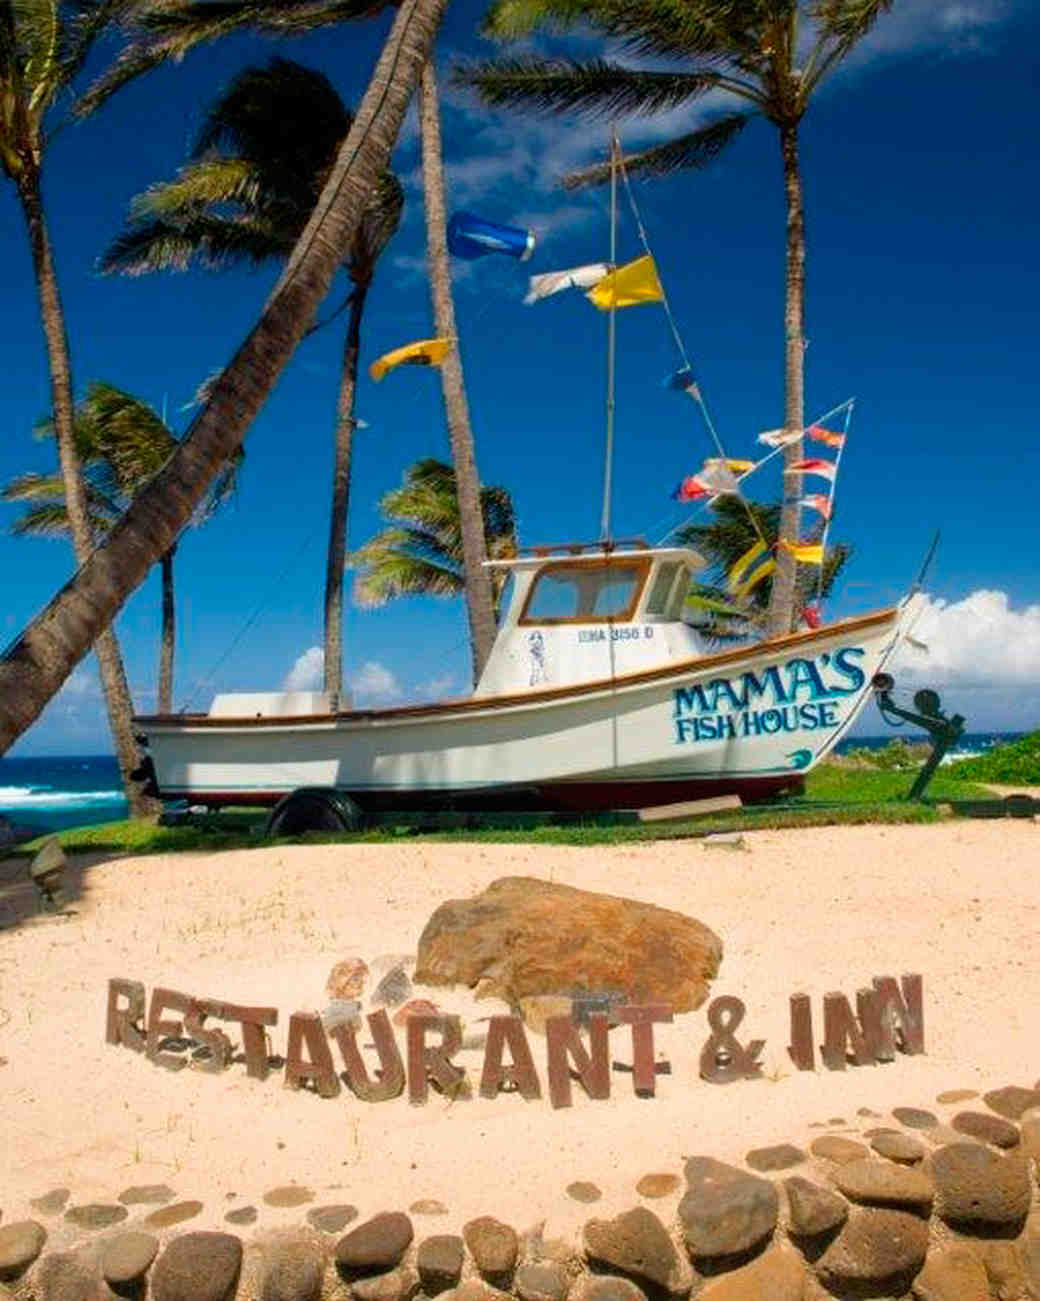 hawaii-restaurants-mamas-fish-house-maui-0515.jpg